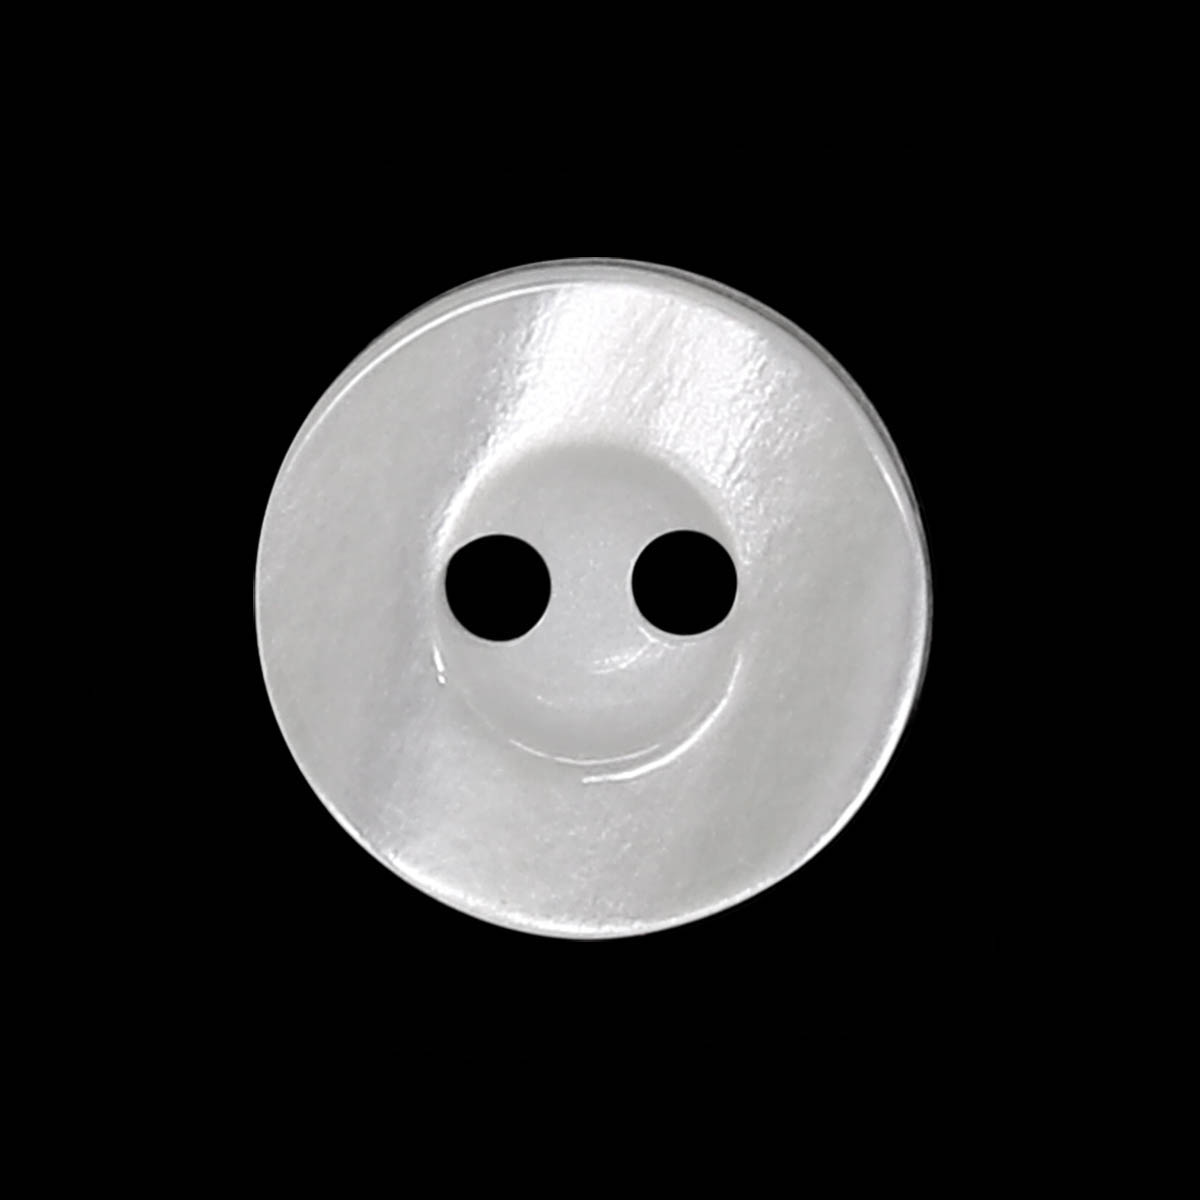 351225/2 20 (3512) Пуговица 2прокола бел.глянц.полиэстер